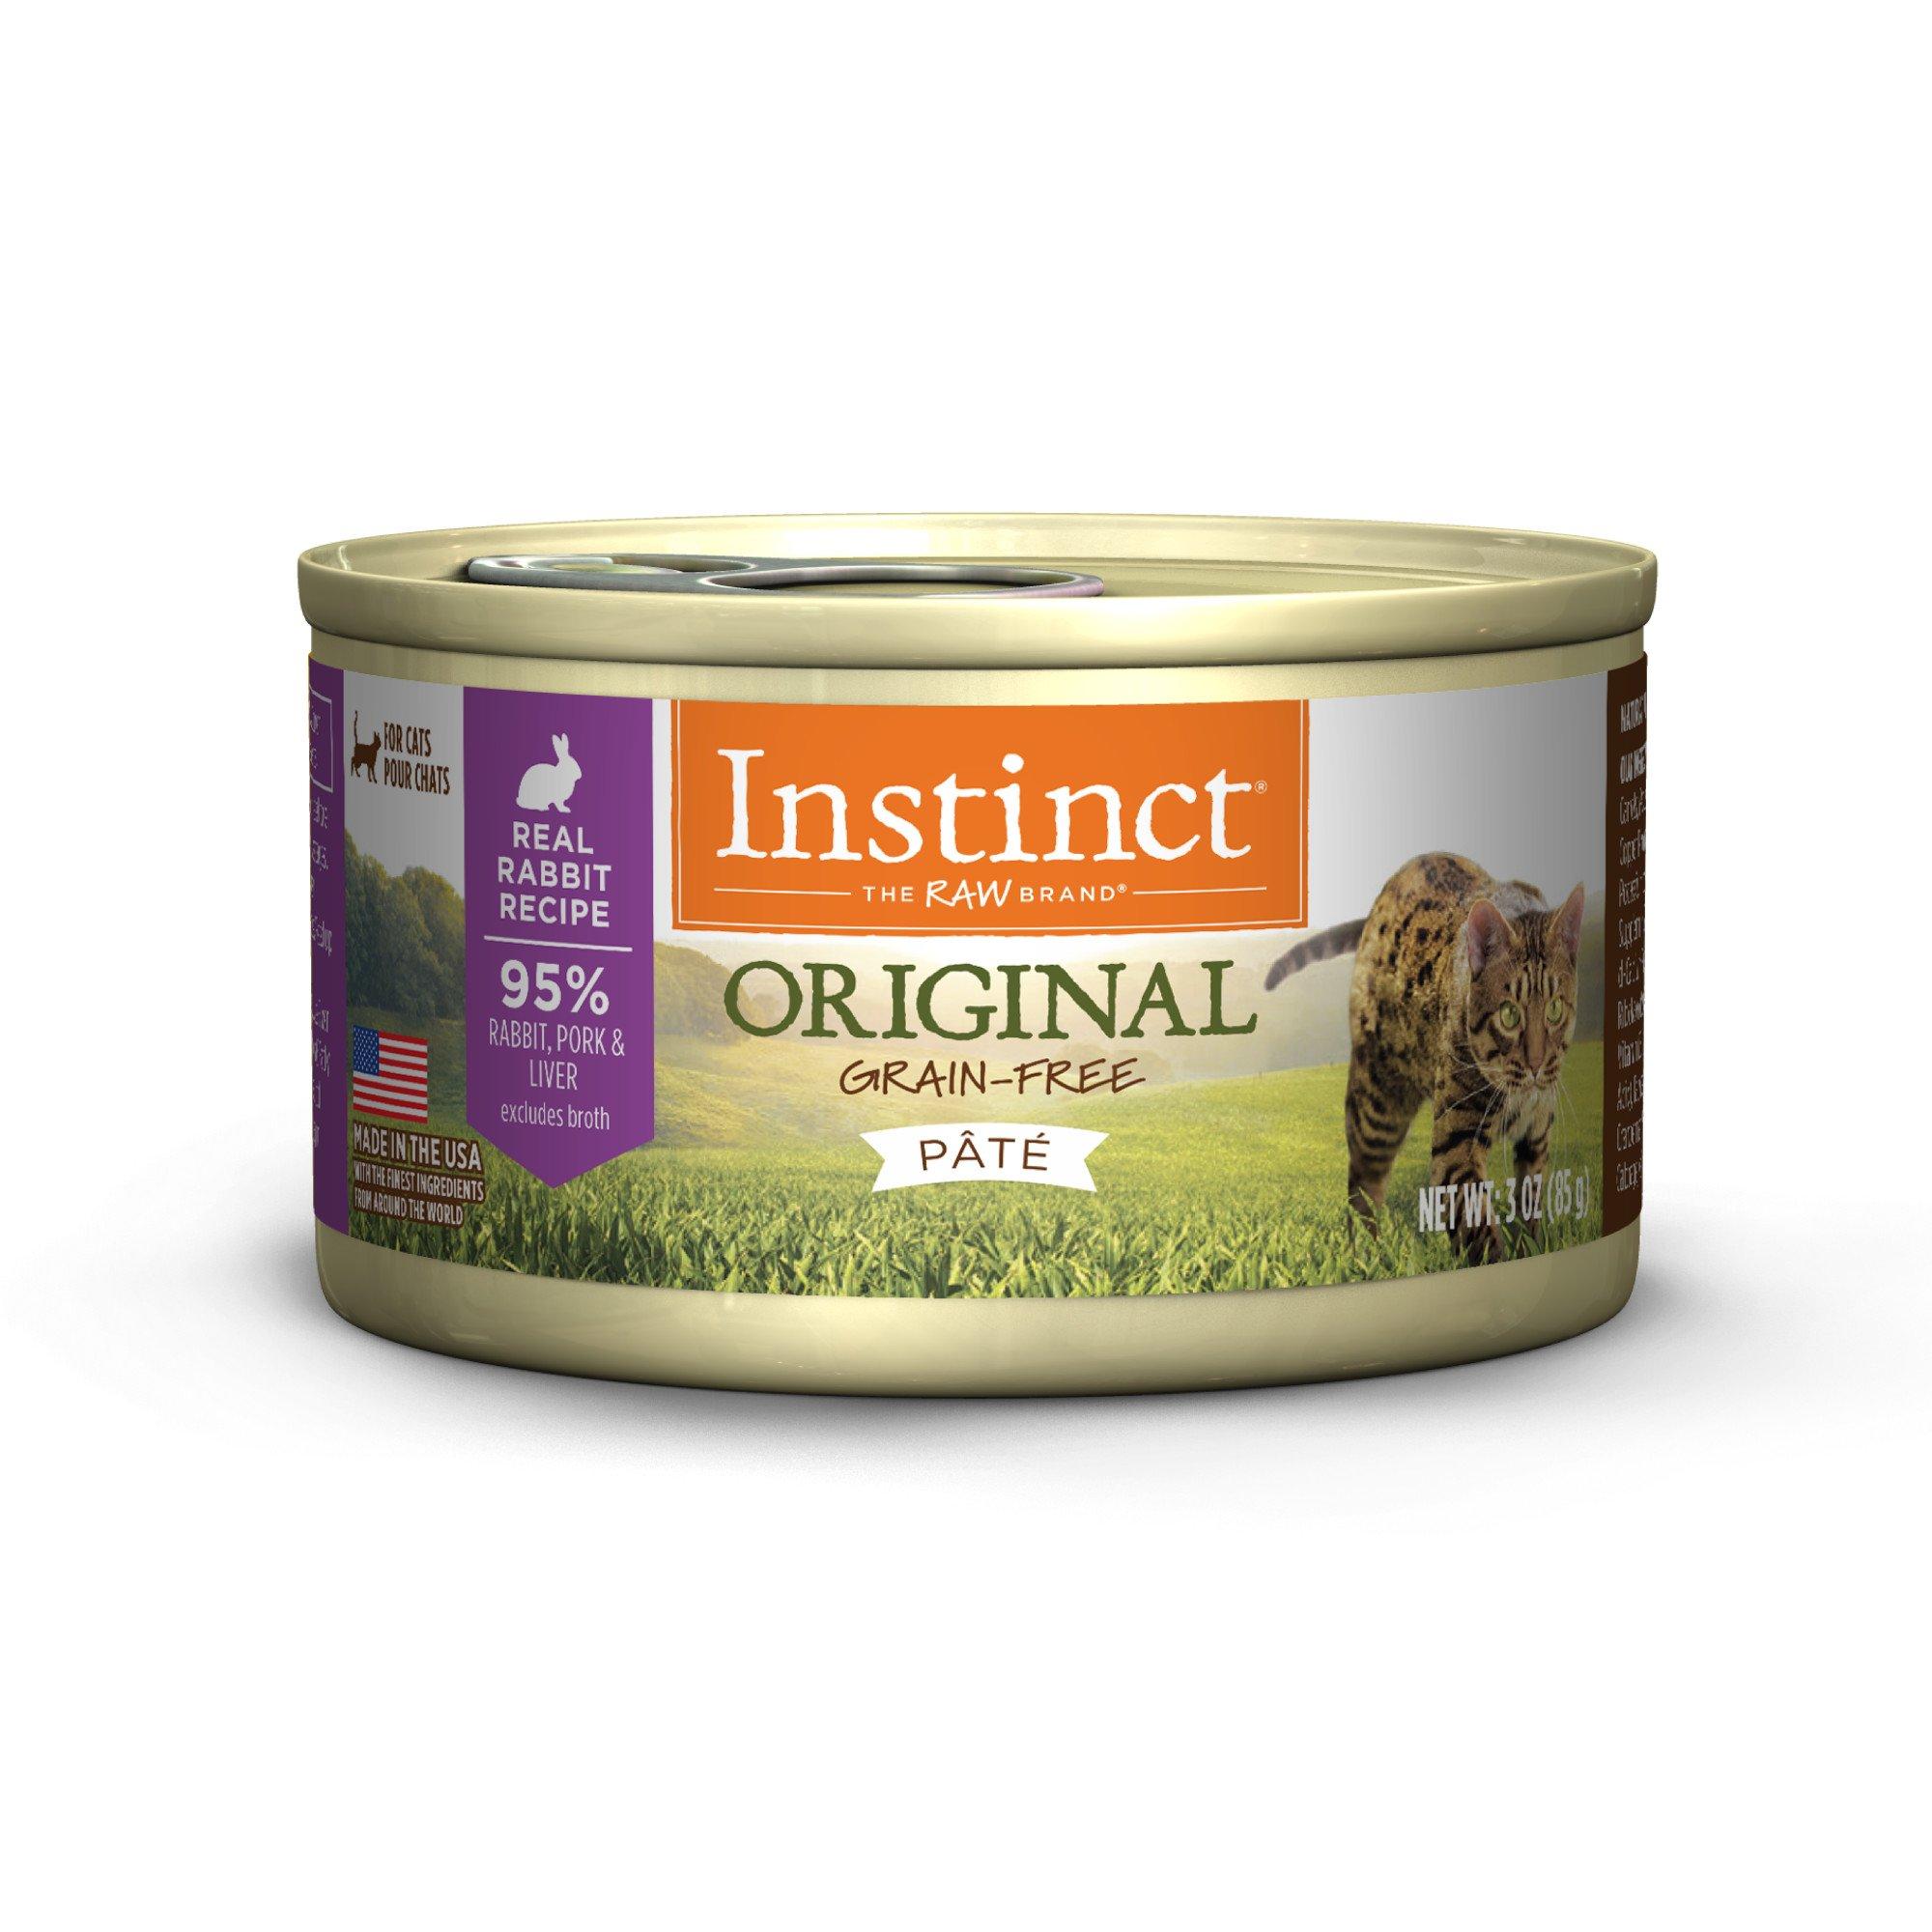 Nature's Variety Instinct Grain-Free Rabbit Canned Cat Food